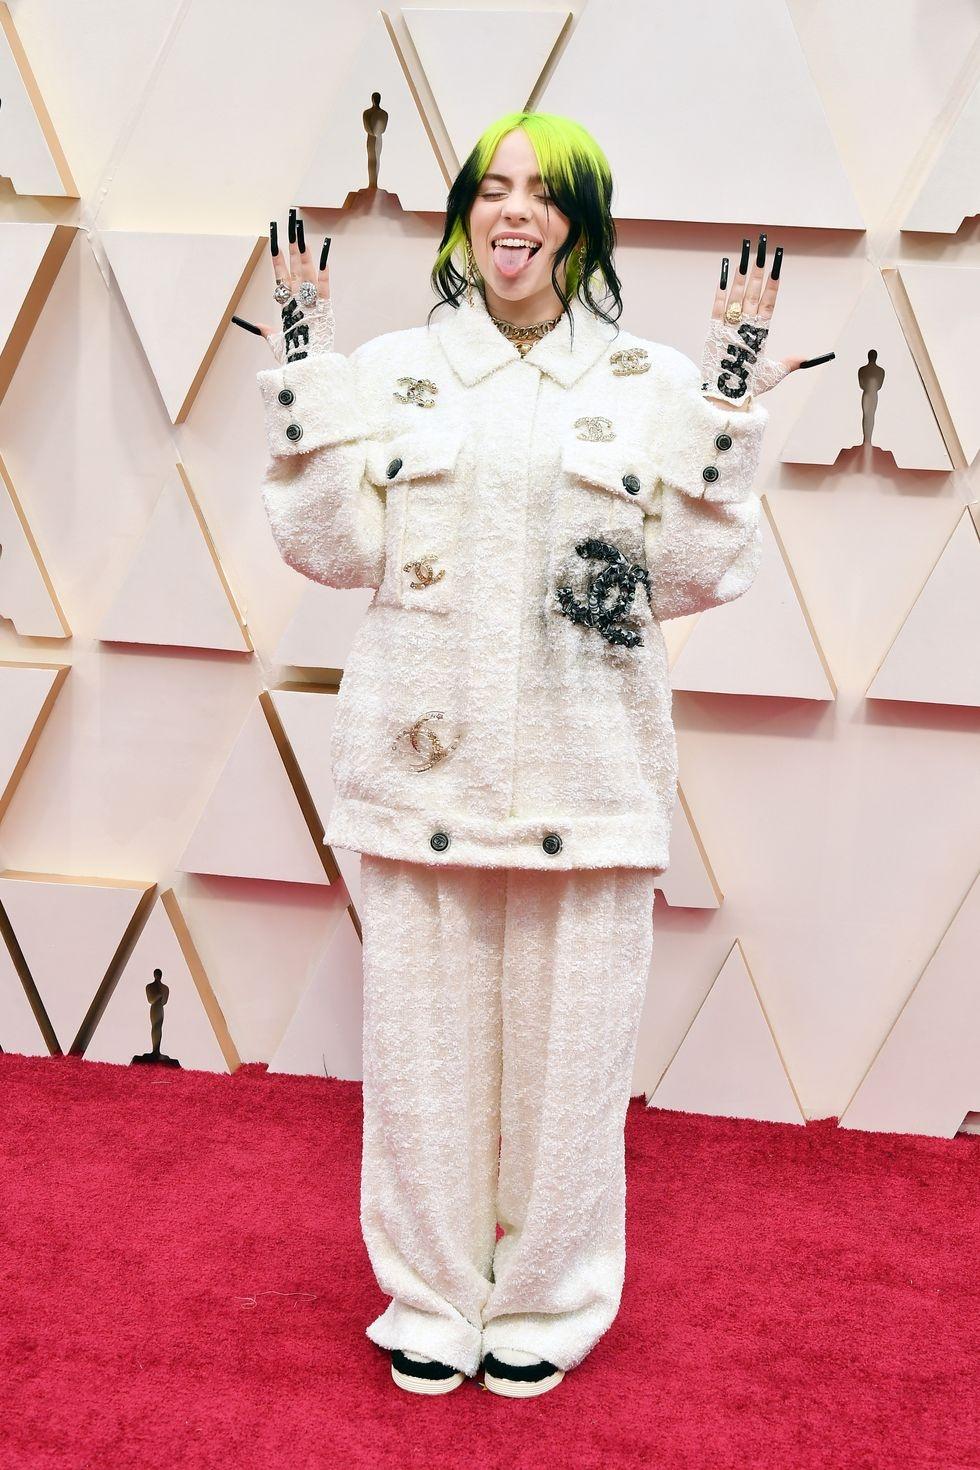 Sao nu mac dep tren tham do Oscar 2020 hinh anh 4 gettyimages_1205131666.jpg